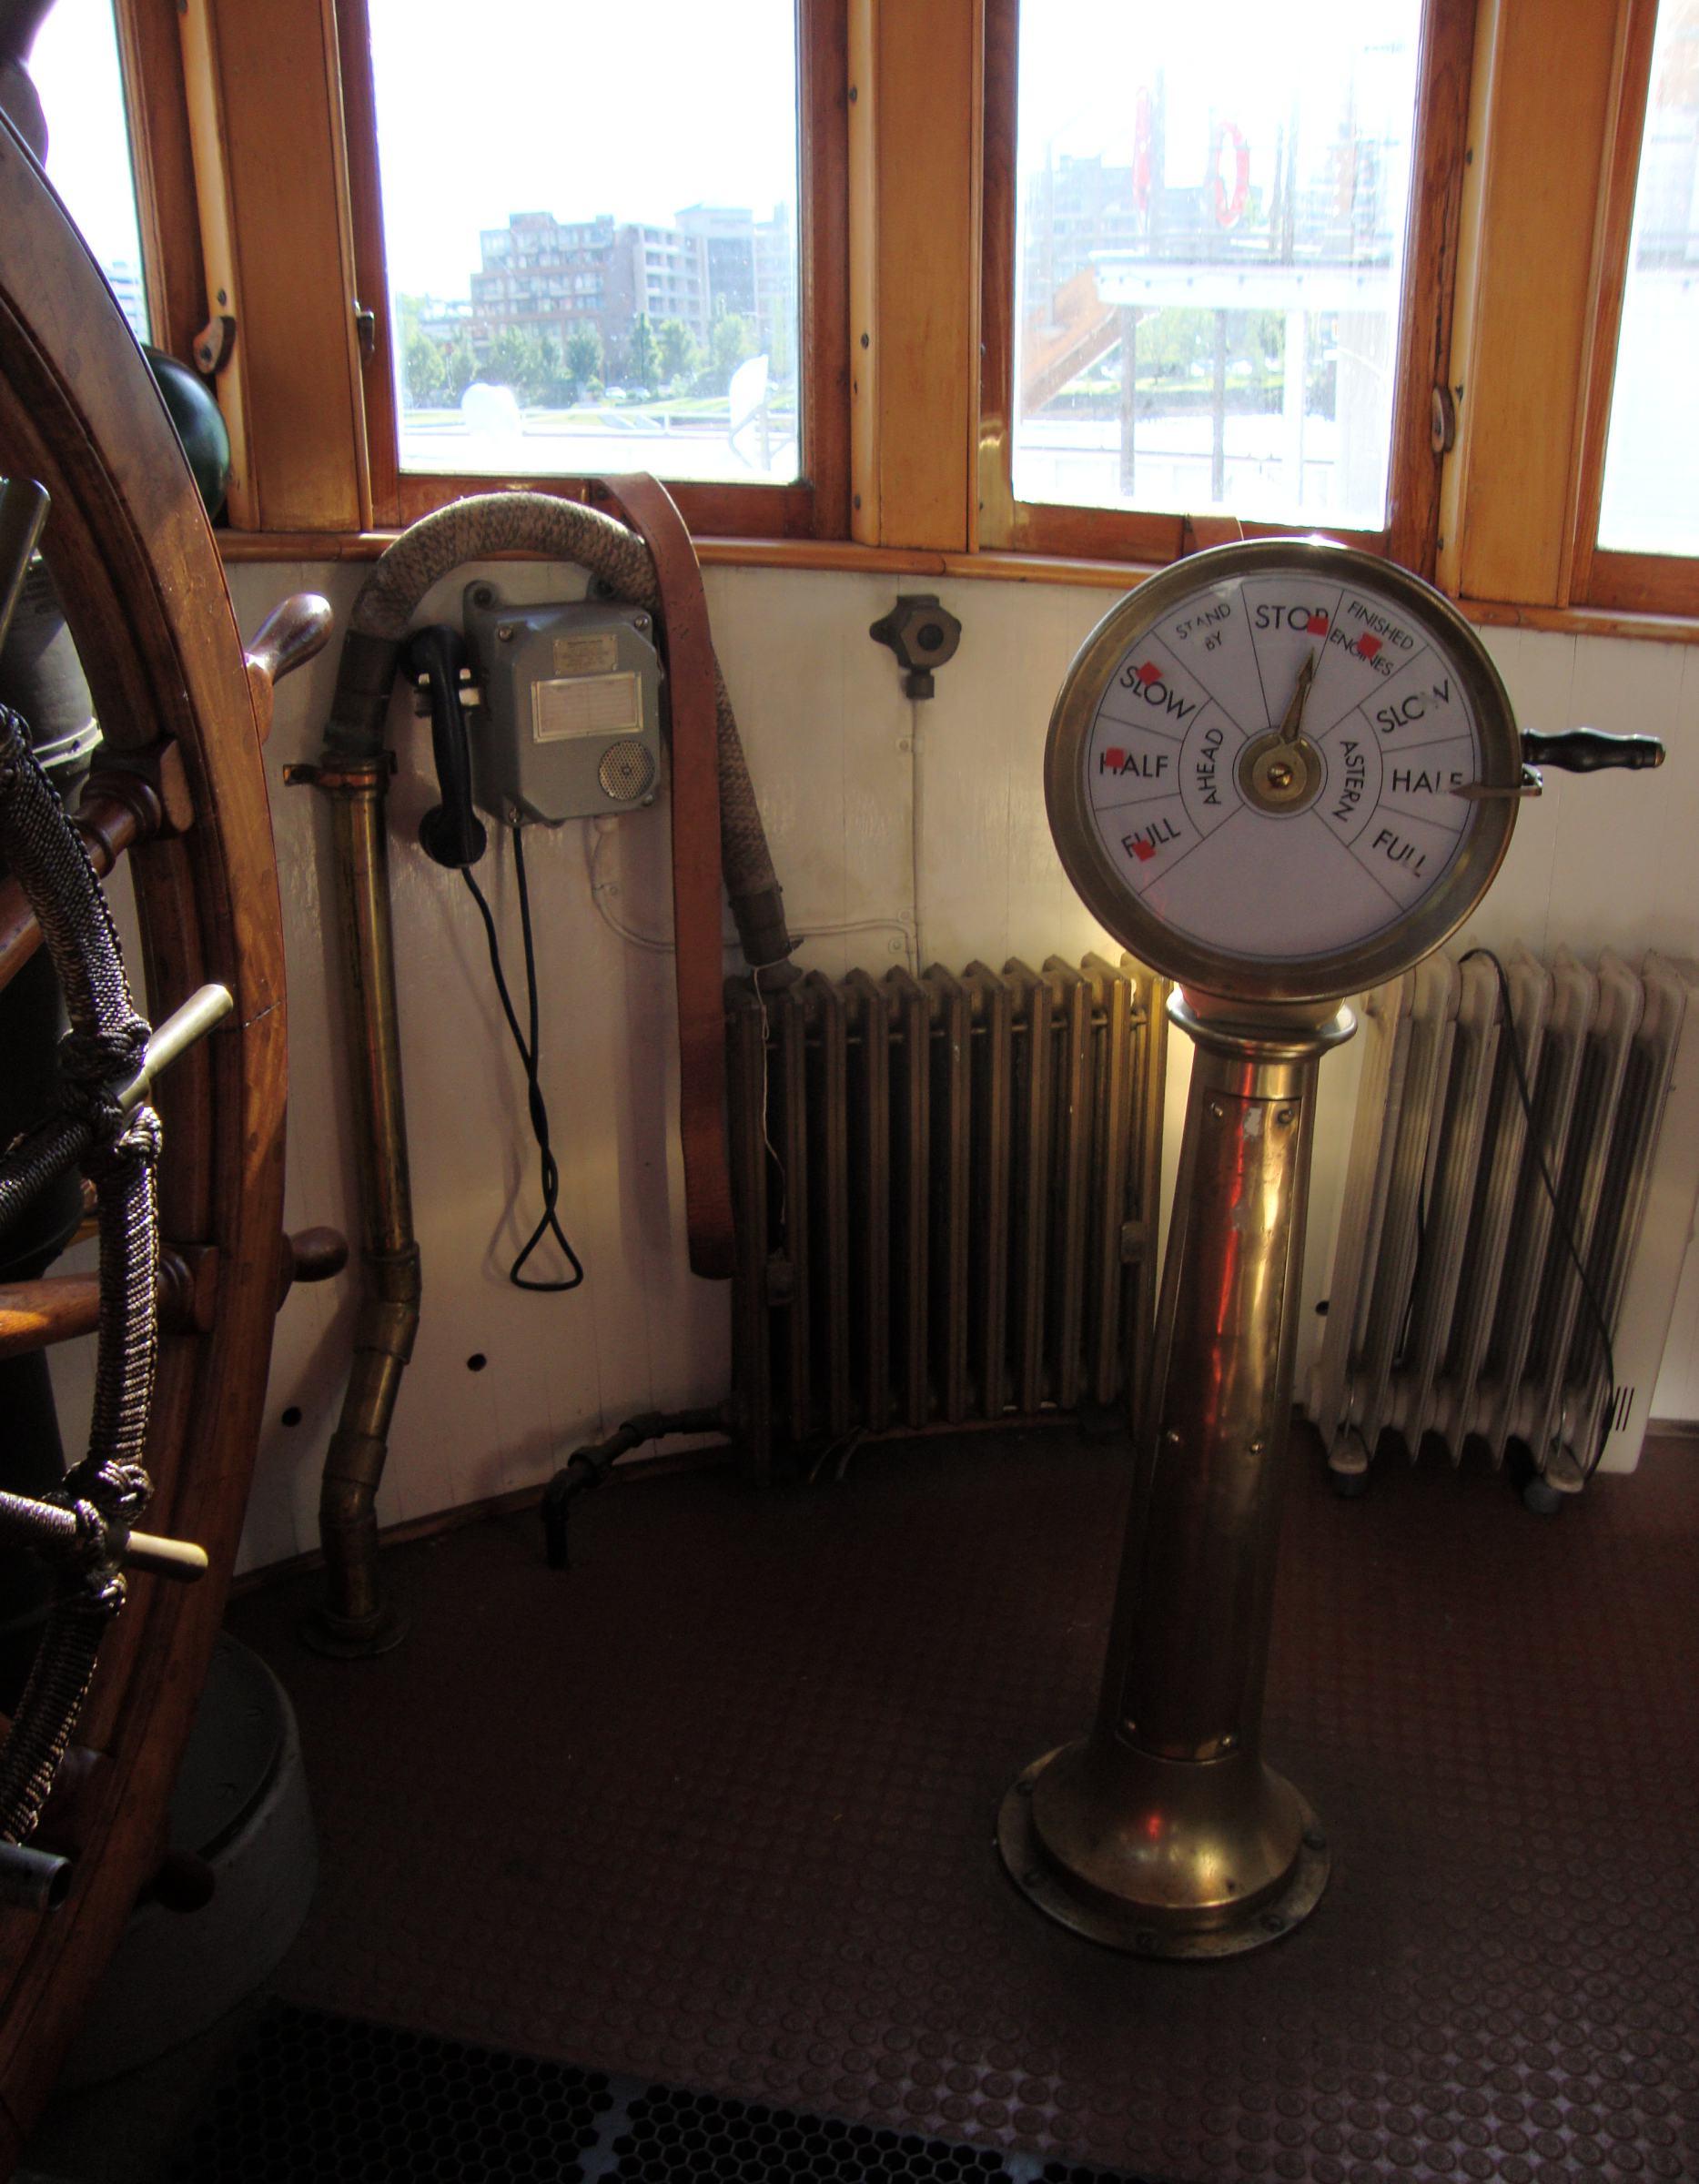 Army Tug Engine Room: The Arthur Foss Leaves The Dock